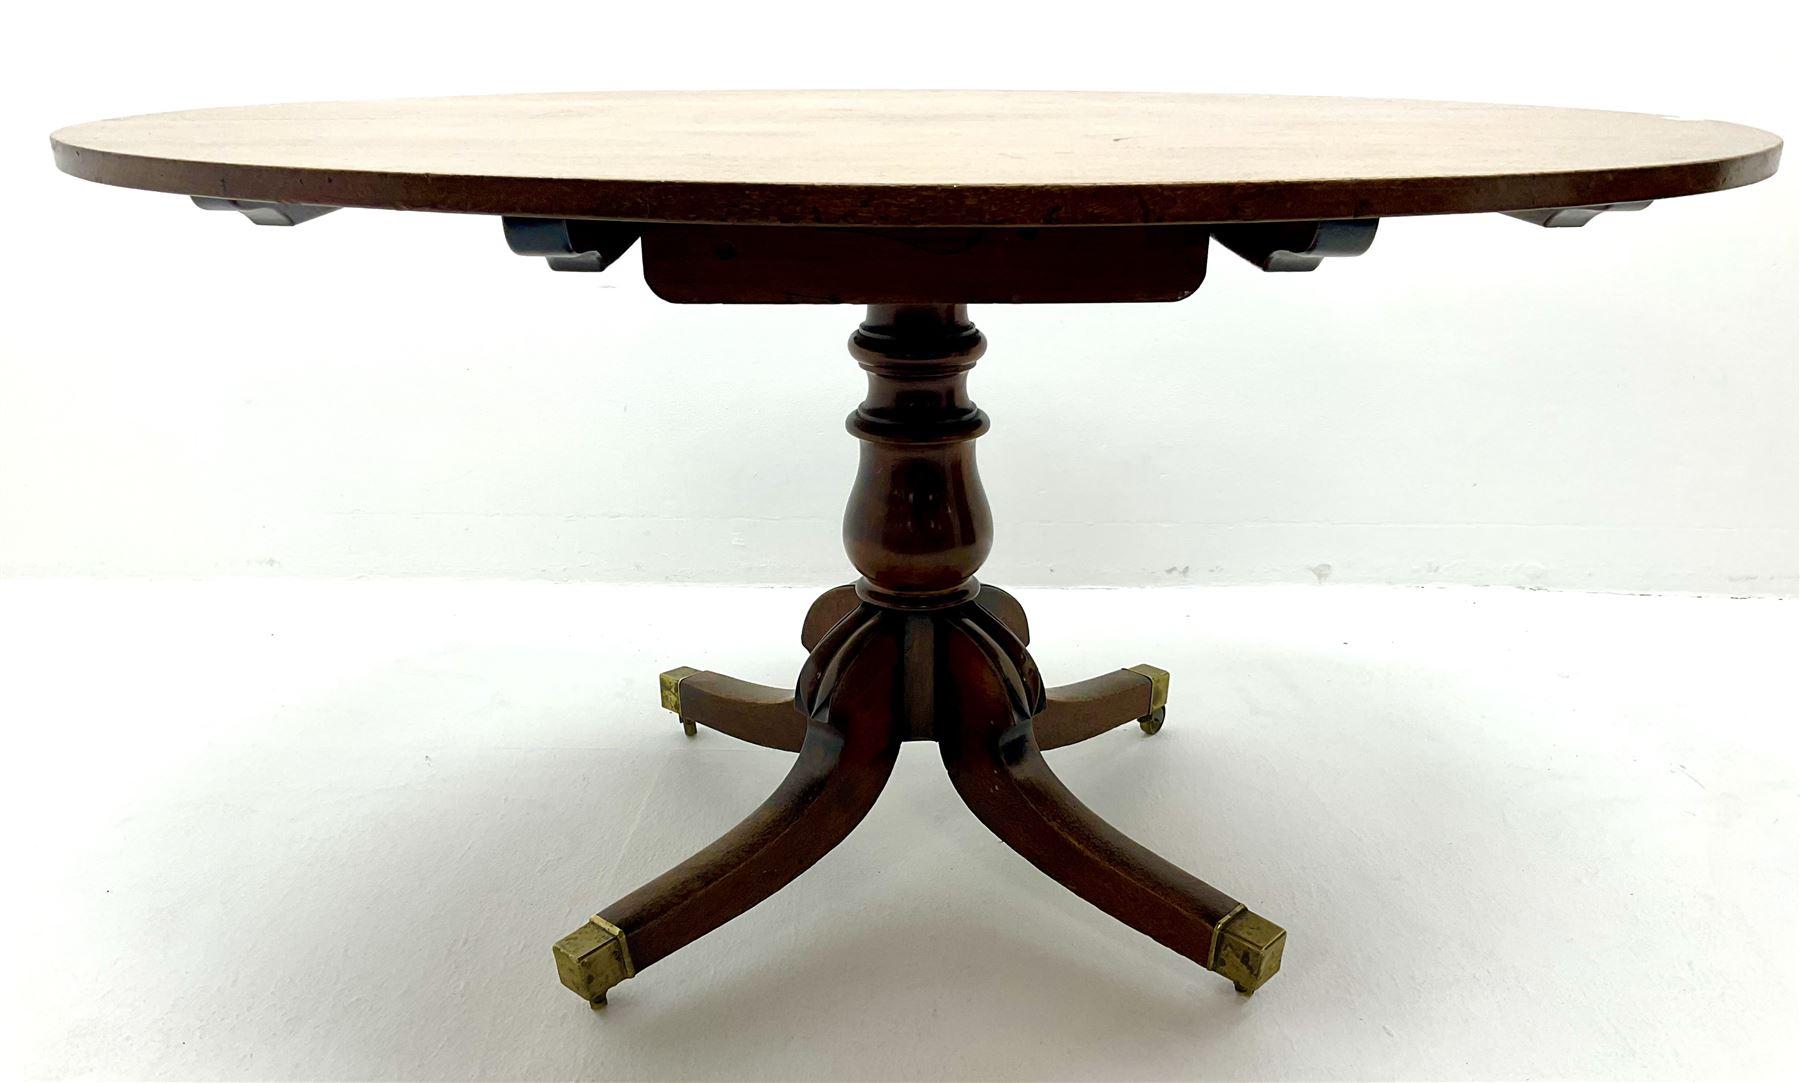 George III oval mahogany breakfast table - Image 3 of 4